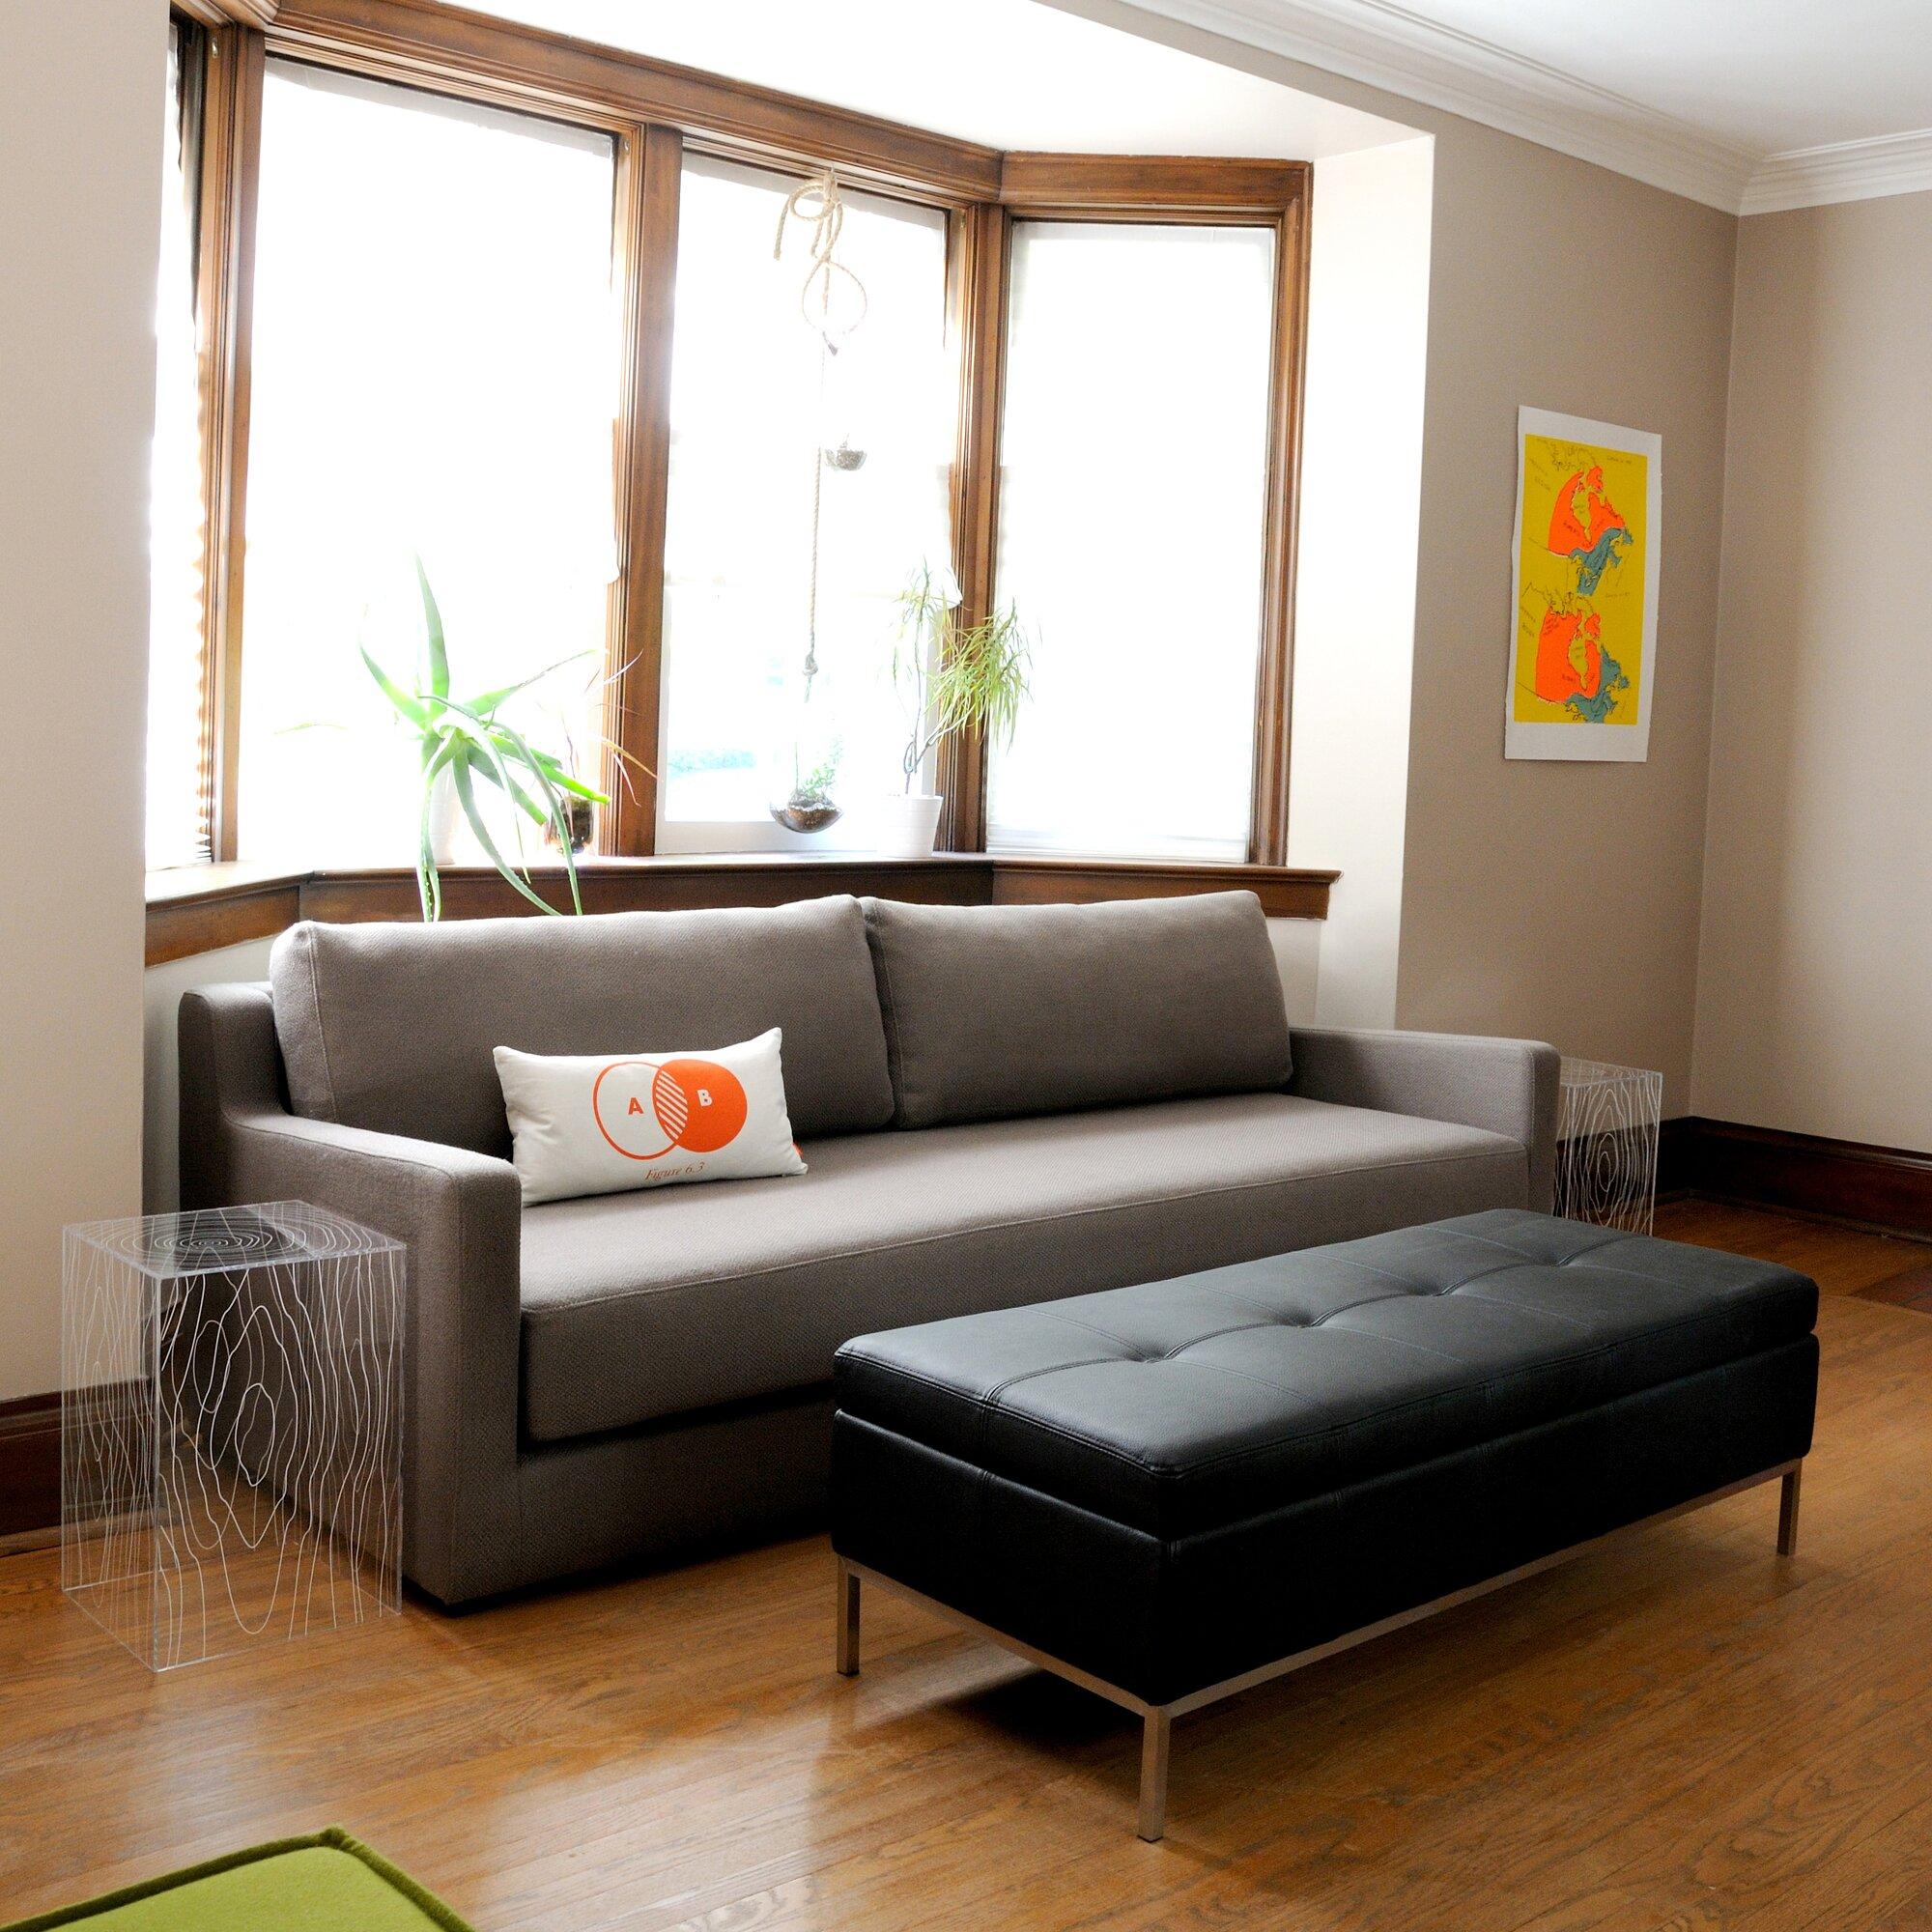 flip sleeper sofa reviews allmodern. Black Bedroom Furniture Sets. Home Design Ideas